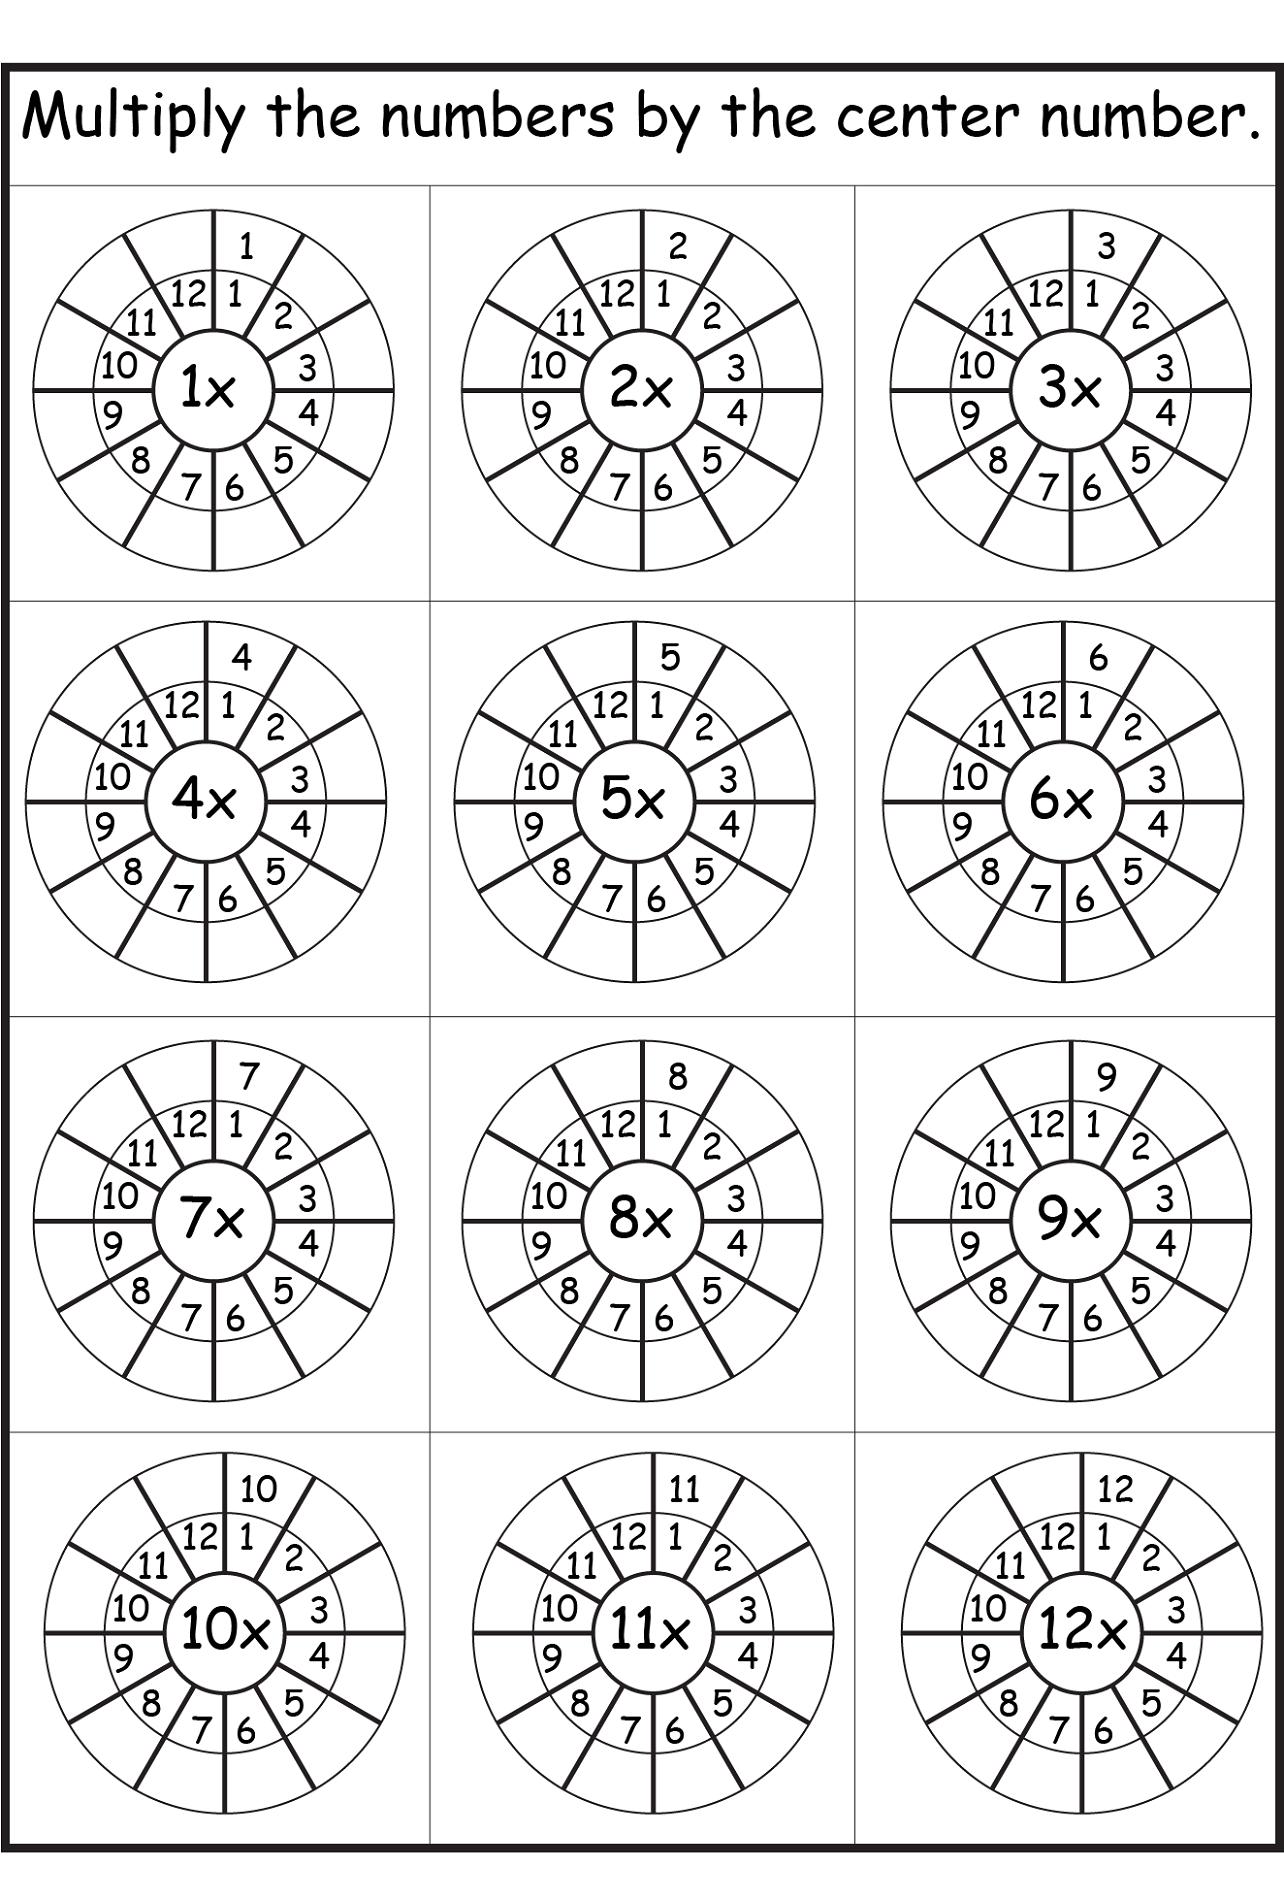 8 times table worksheet interesting